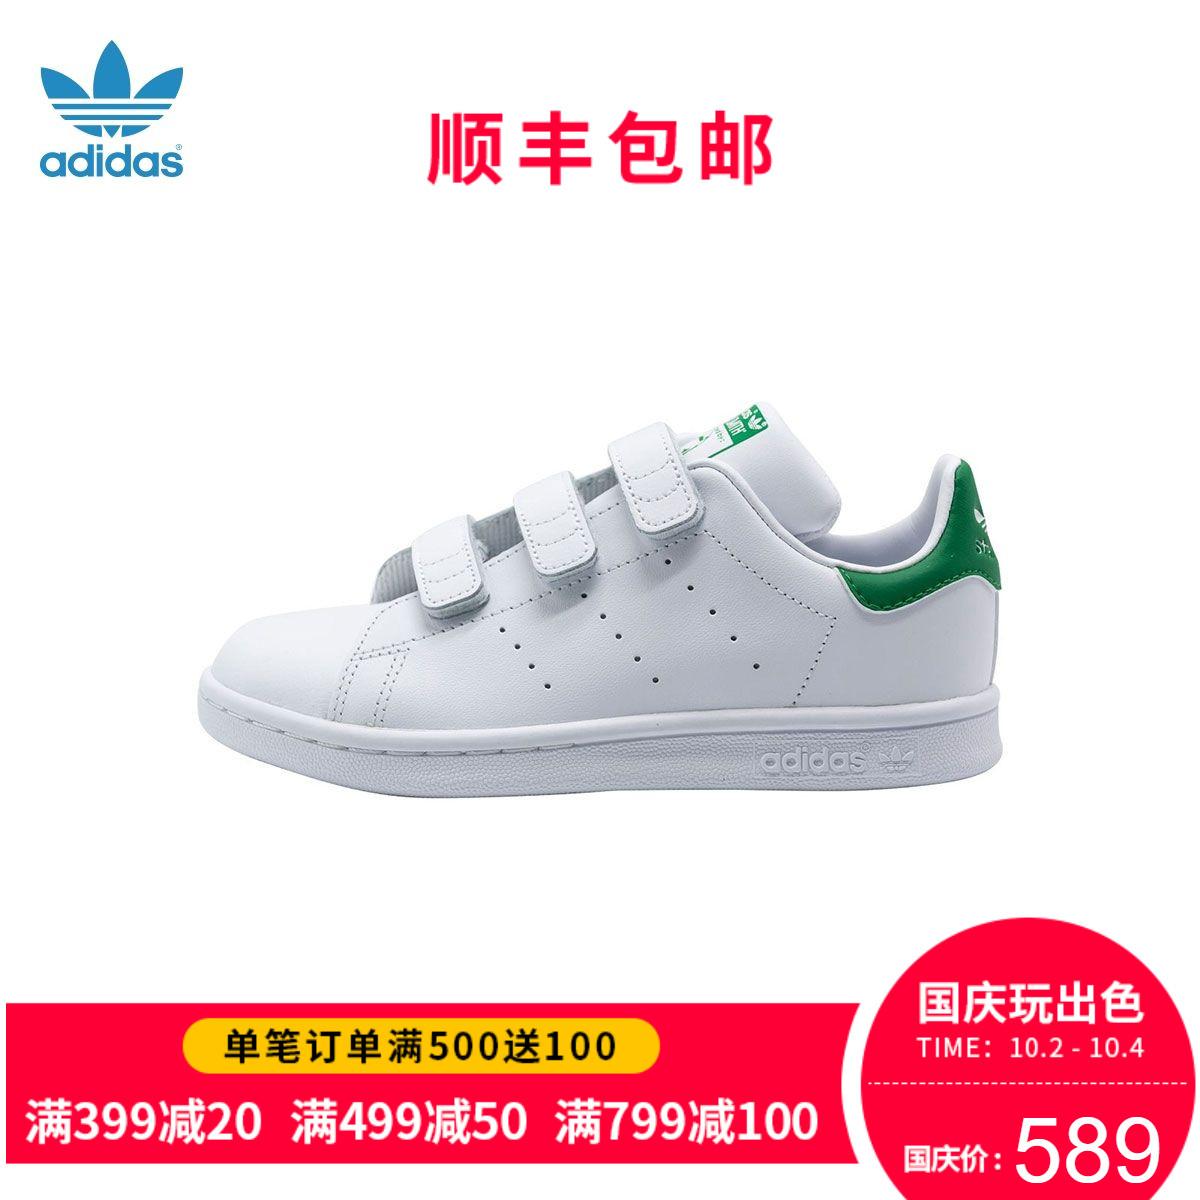 Adidas阿迪达斯绿尾男小童三叶草儿童鞋STAN SMITH J2018运动鞋